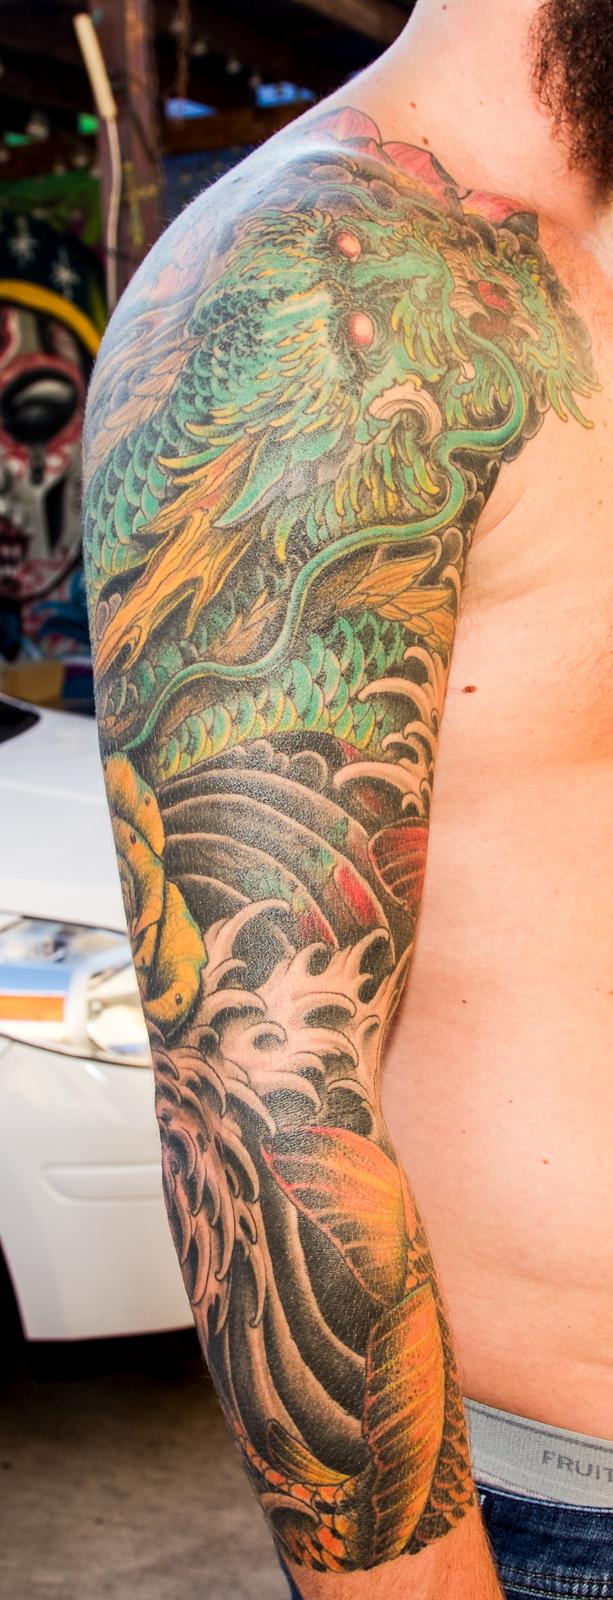 Japanese sleeve 1 enrique bernal ejay tattoo.jpg